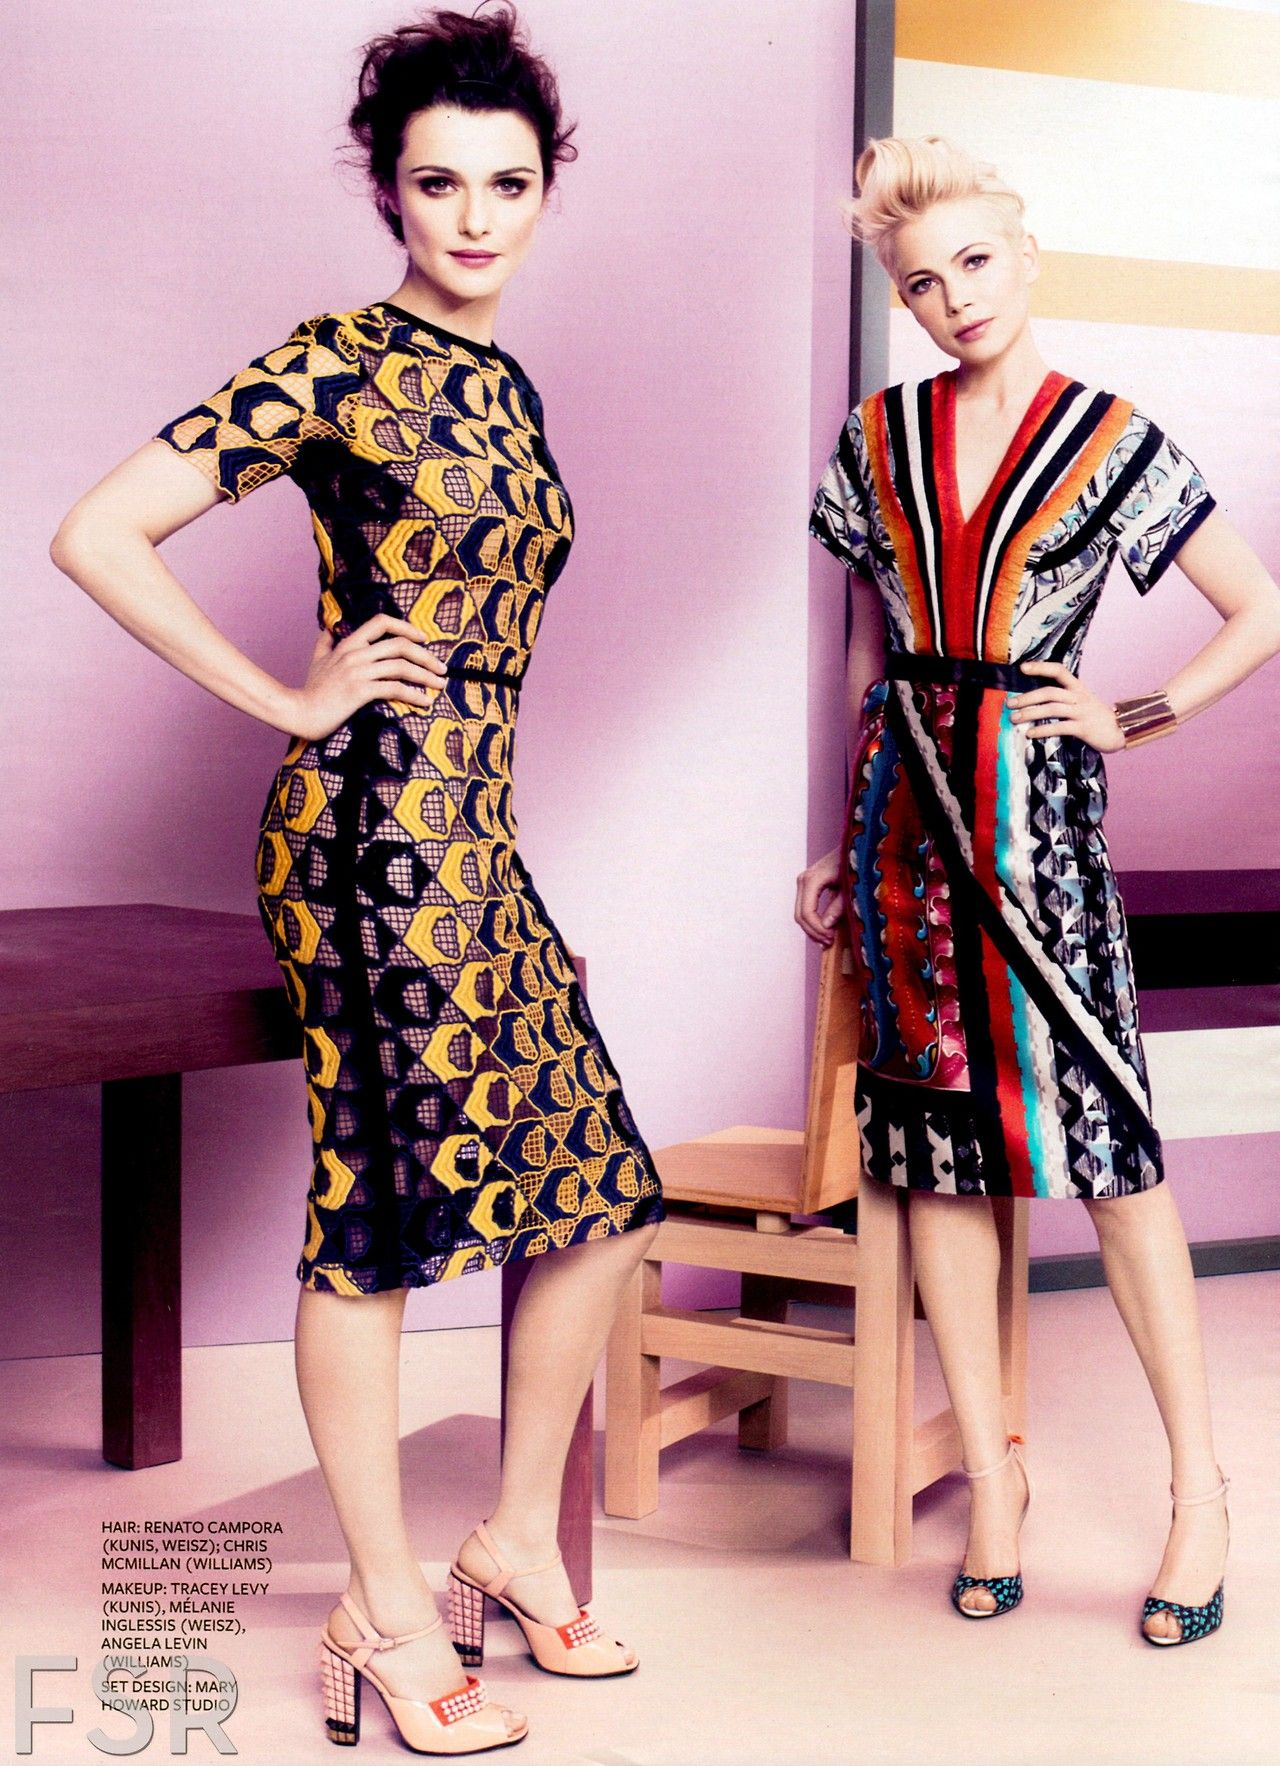 Michelle WIlliams & Rachel Weisz by Michelangelo Di Battista for In Style